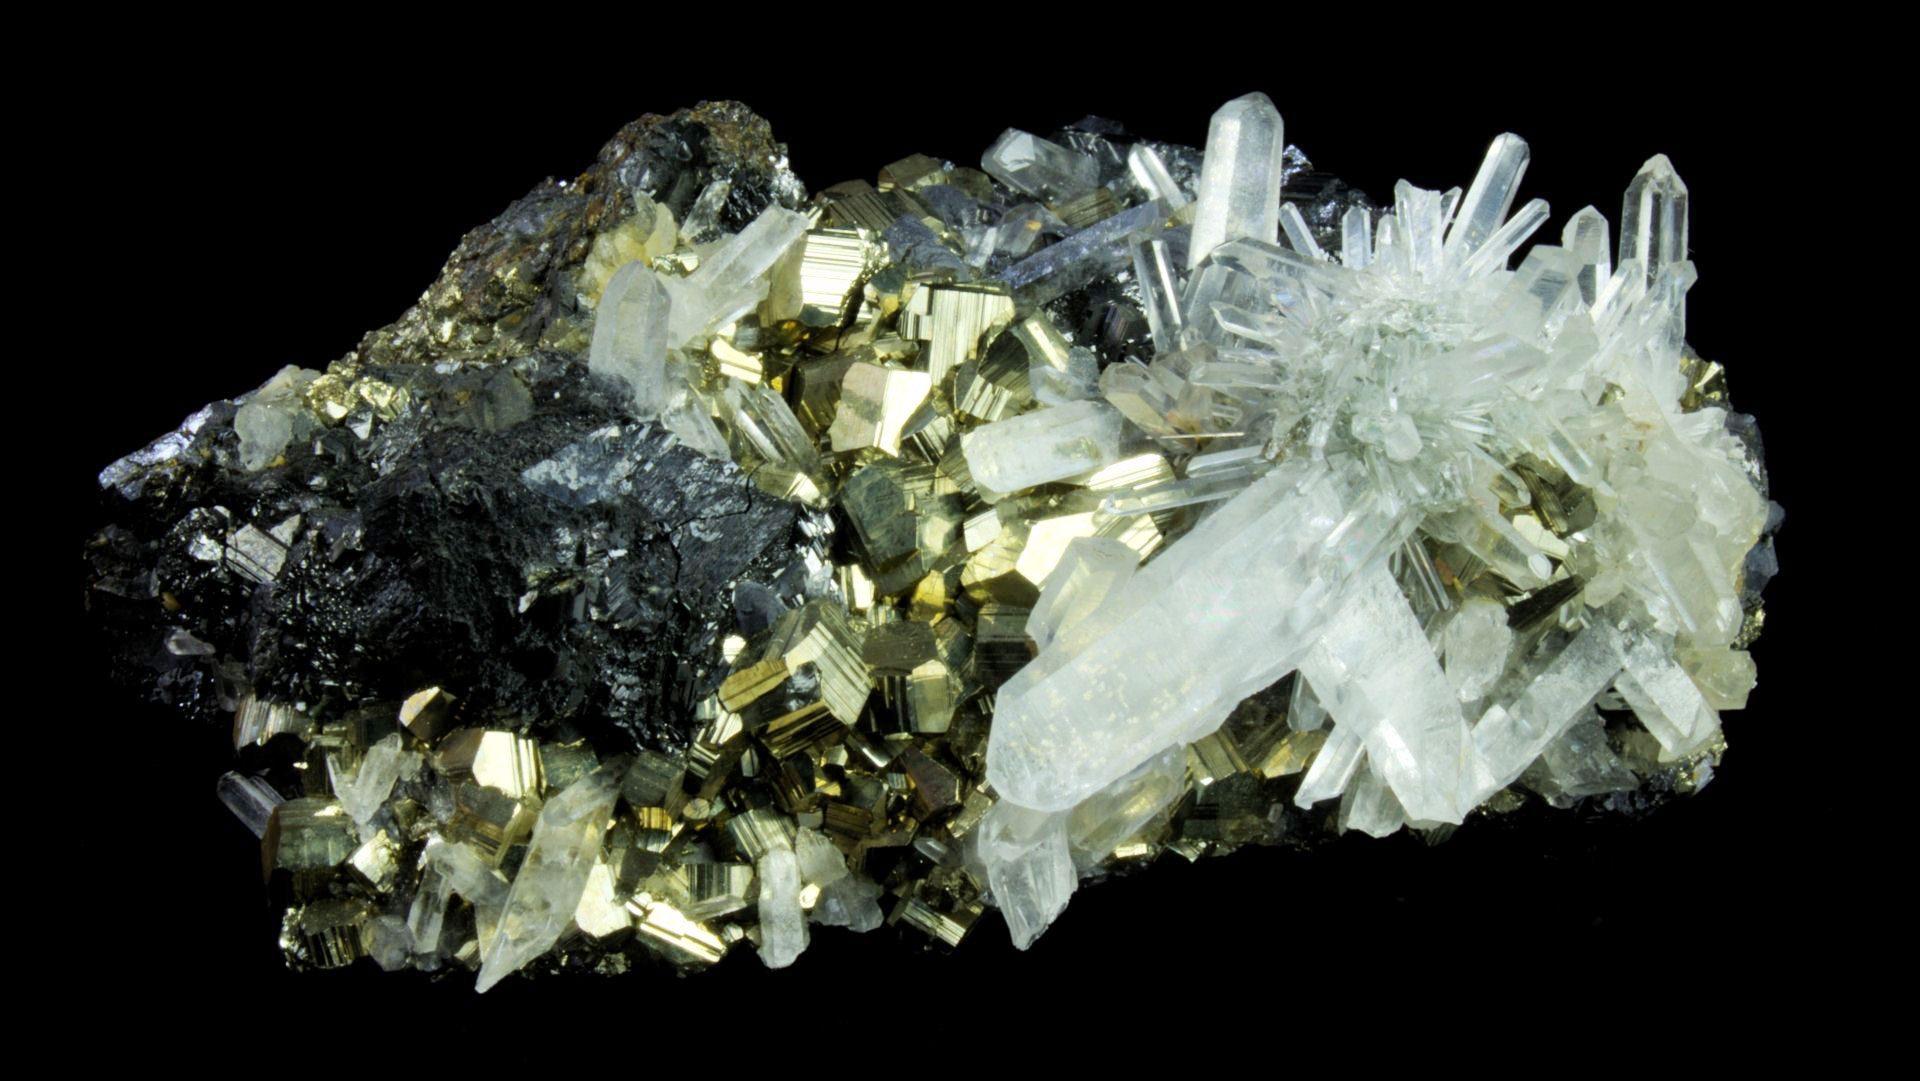 Galena Crystal Specimen - Mineral Specimen